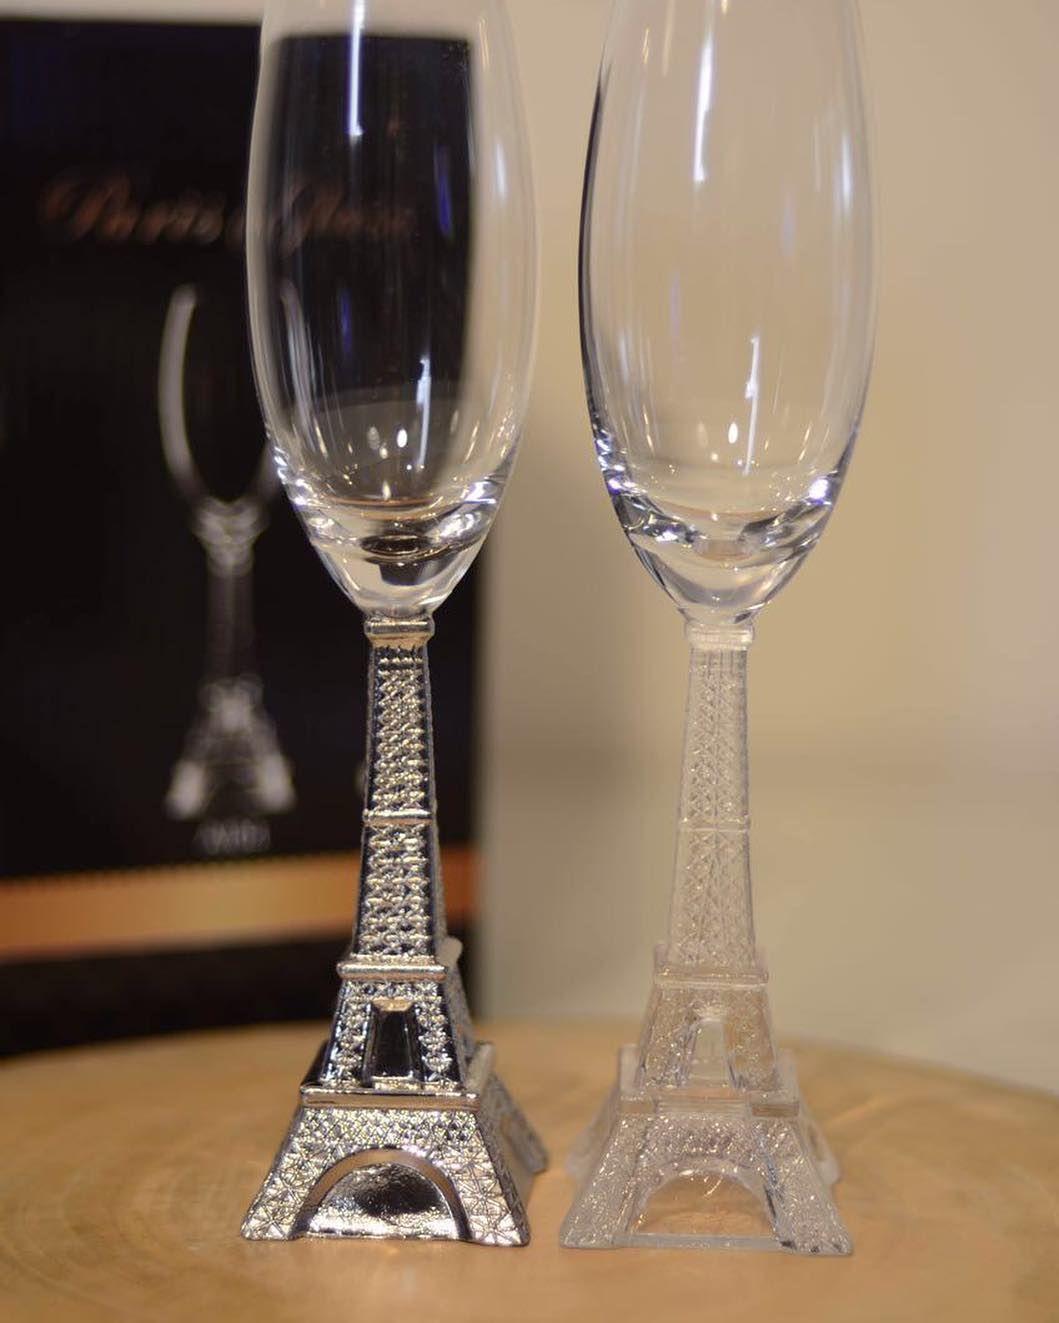 Eiffel Tower Glass الكرتون 4 كاسات 60 ريال Glassware Champagne Flute Tableware